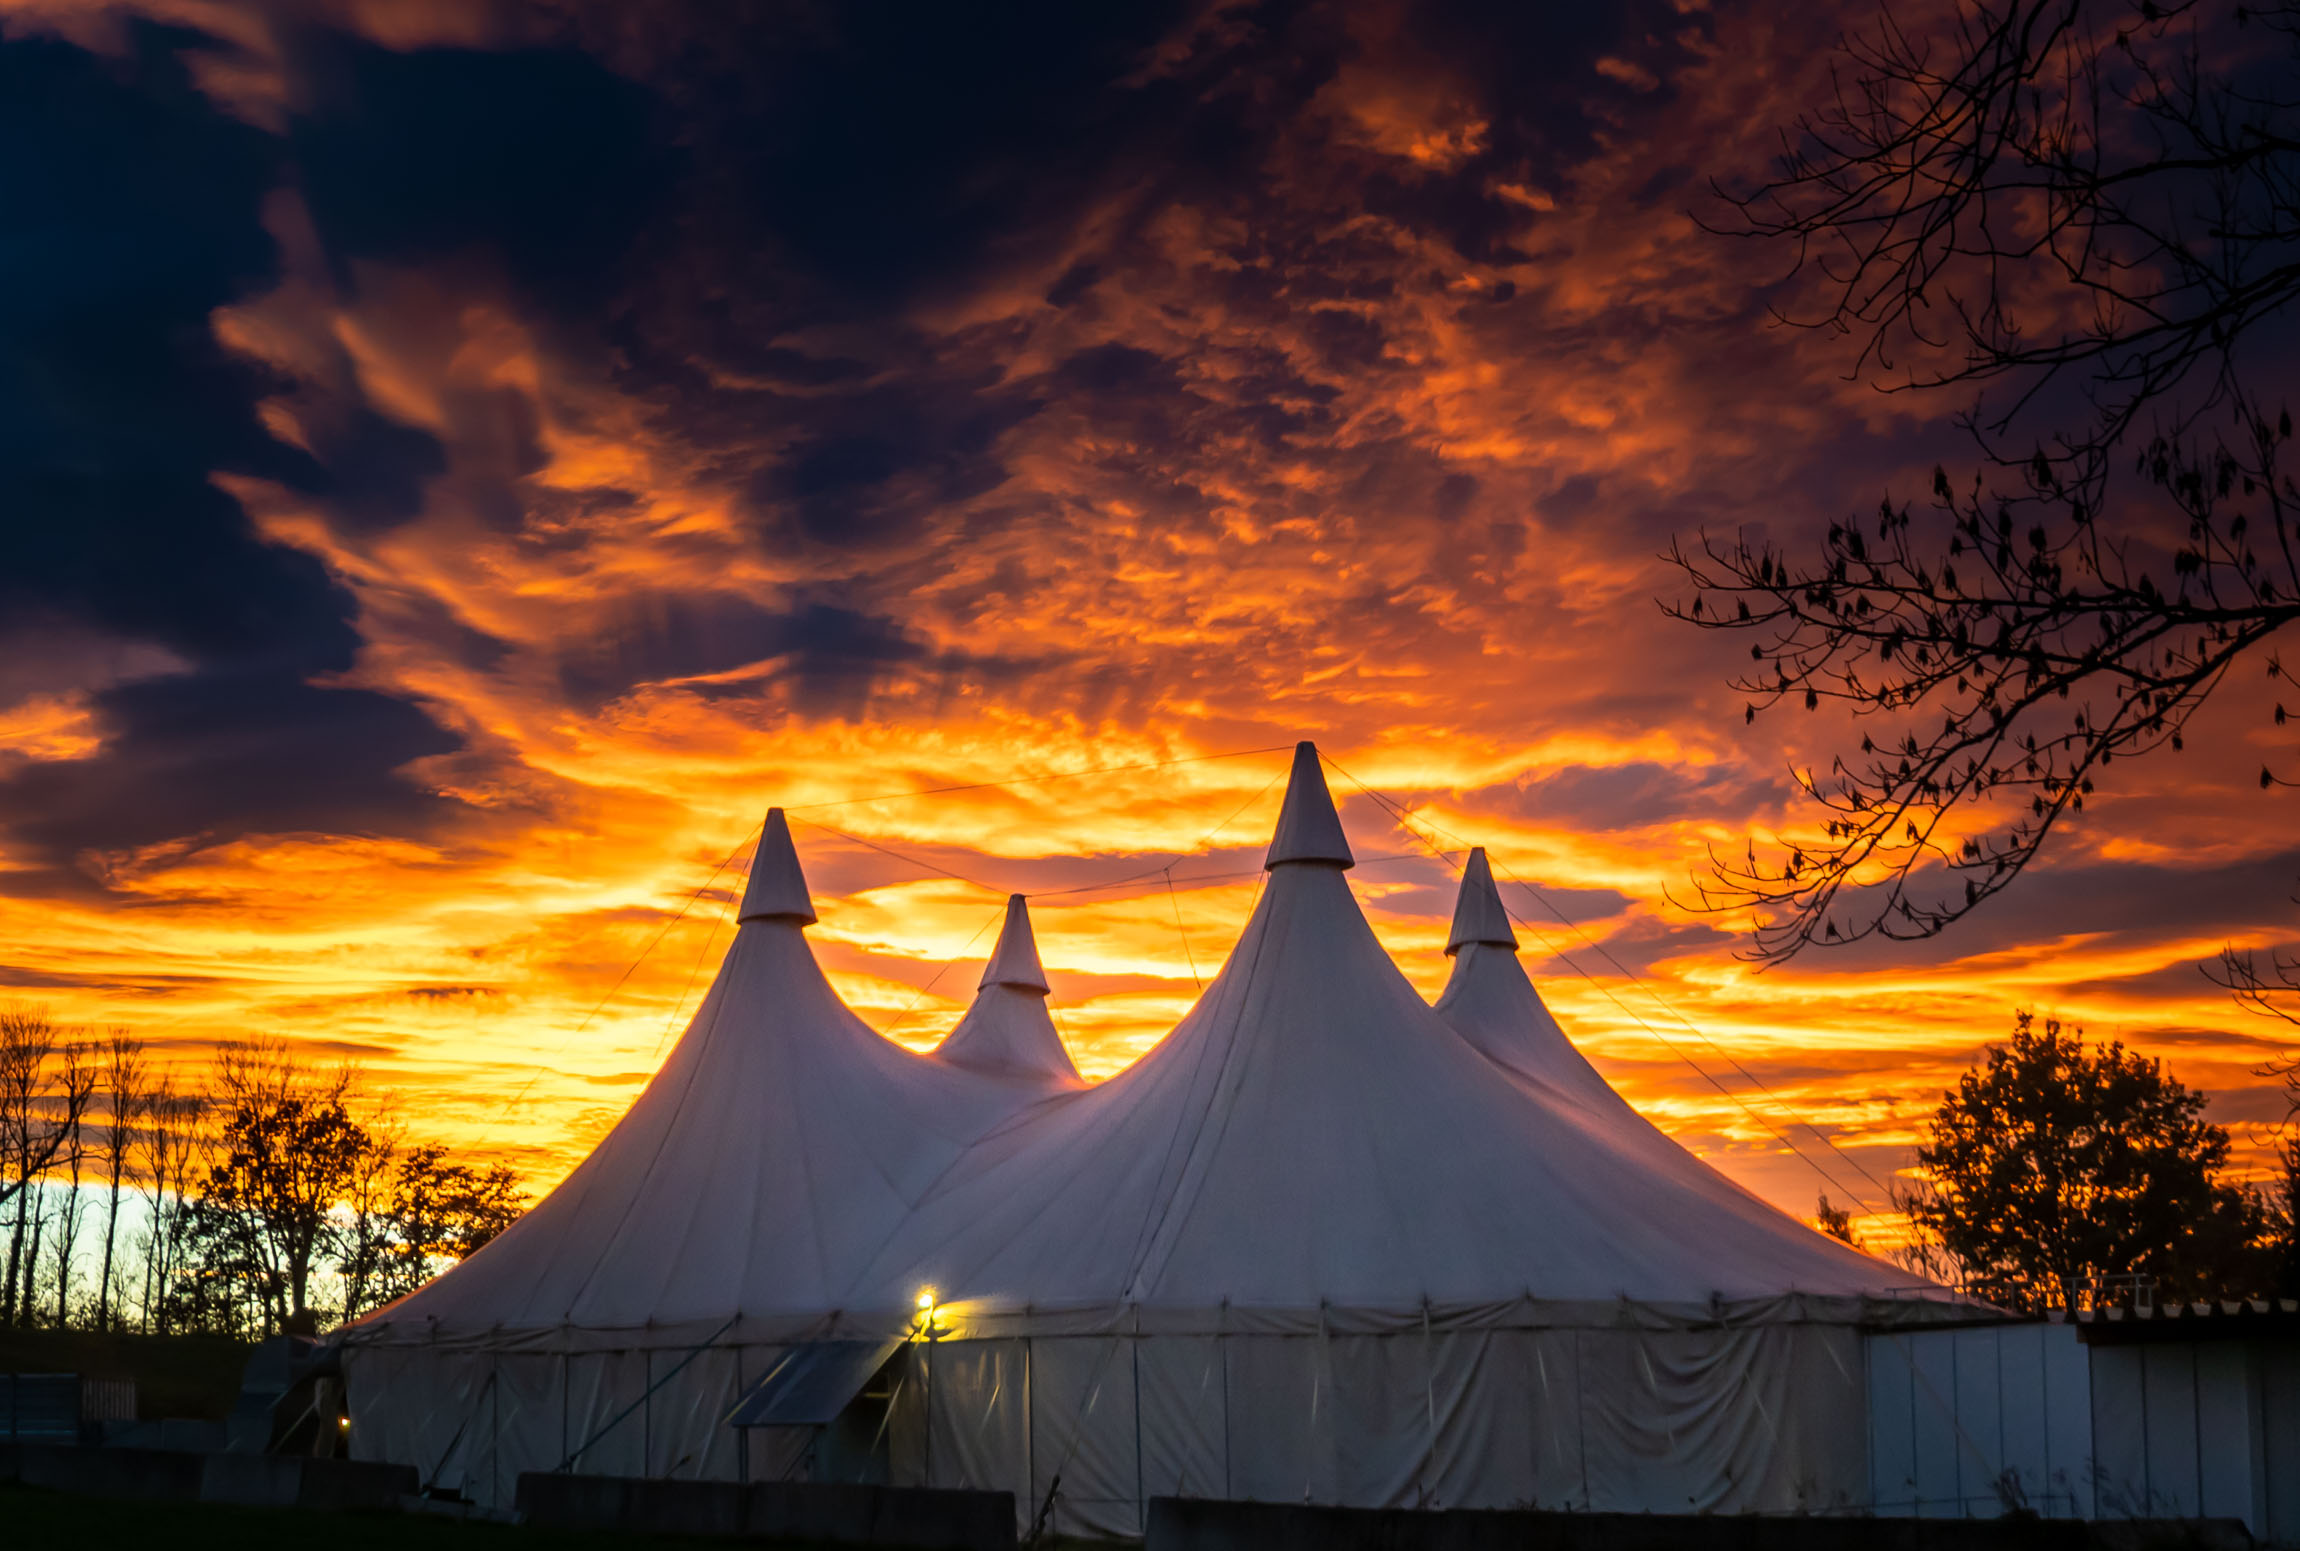 Sonnenuntergang Zelt